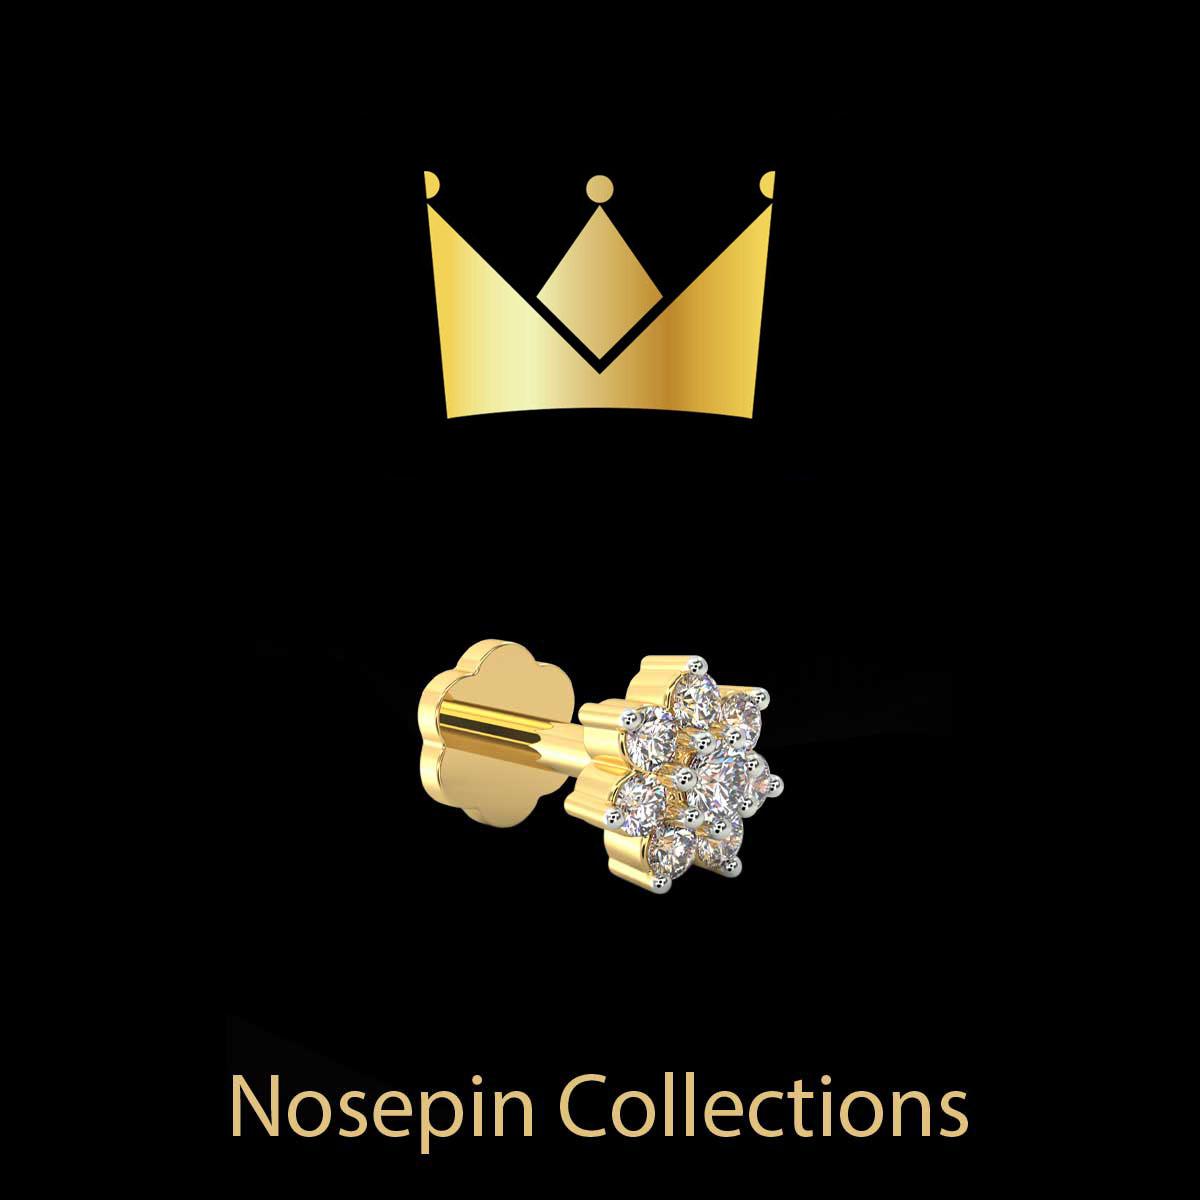 Nosepins